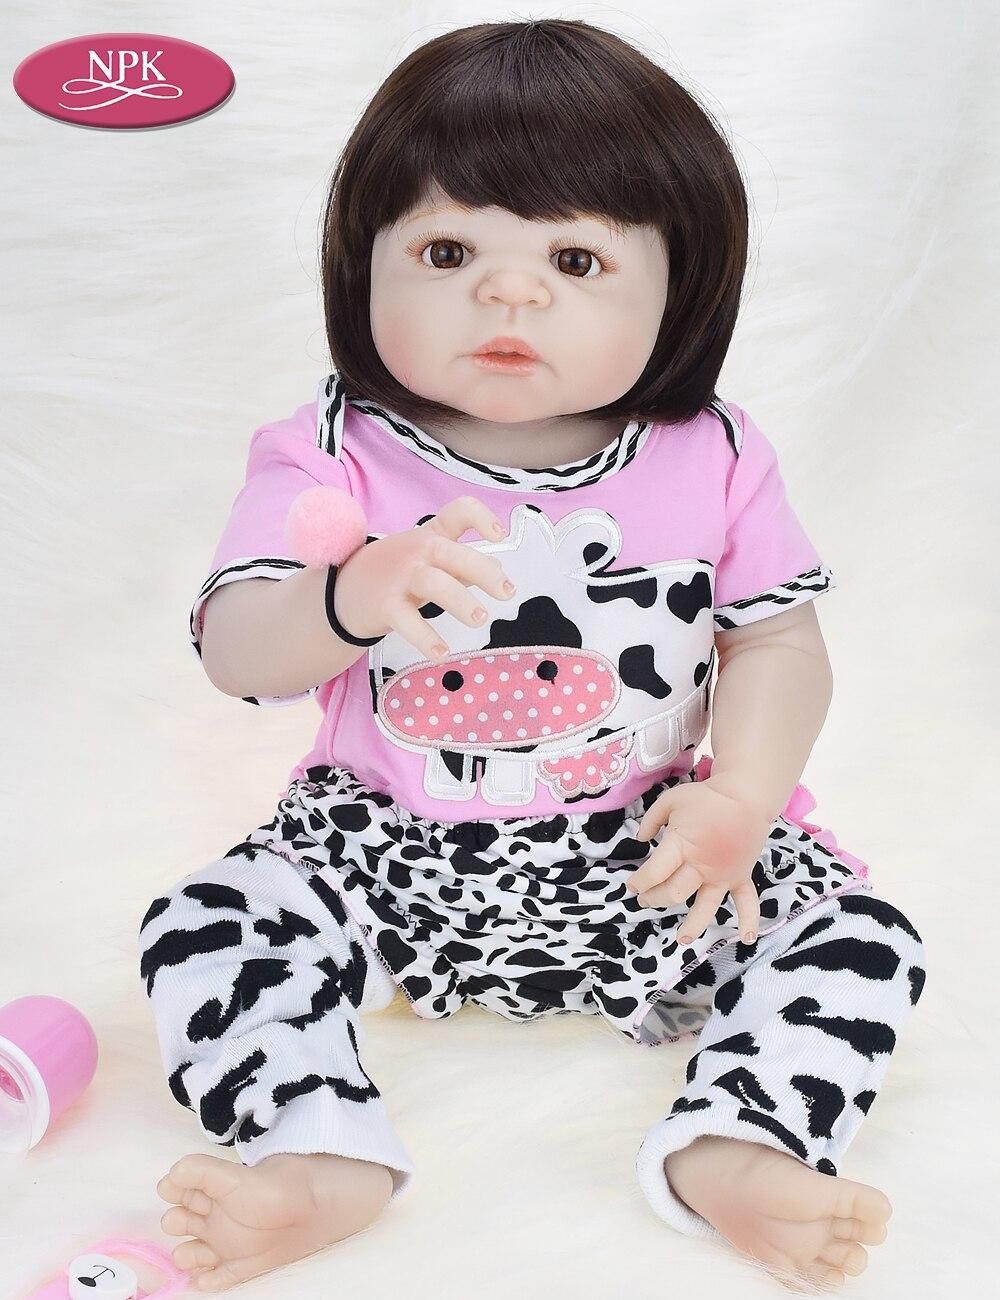 NPK Real 57CM Full Body SIlicone Girl Reborn Babies Doll Bath Toy Lifelike Newborn Princess Baby Doll Bonecas Bebe Reborn Menina (3)